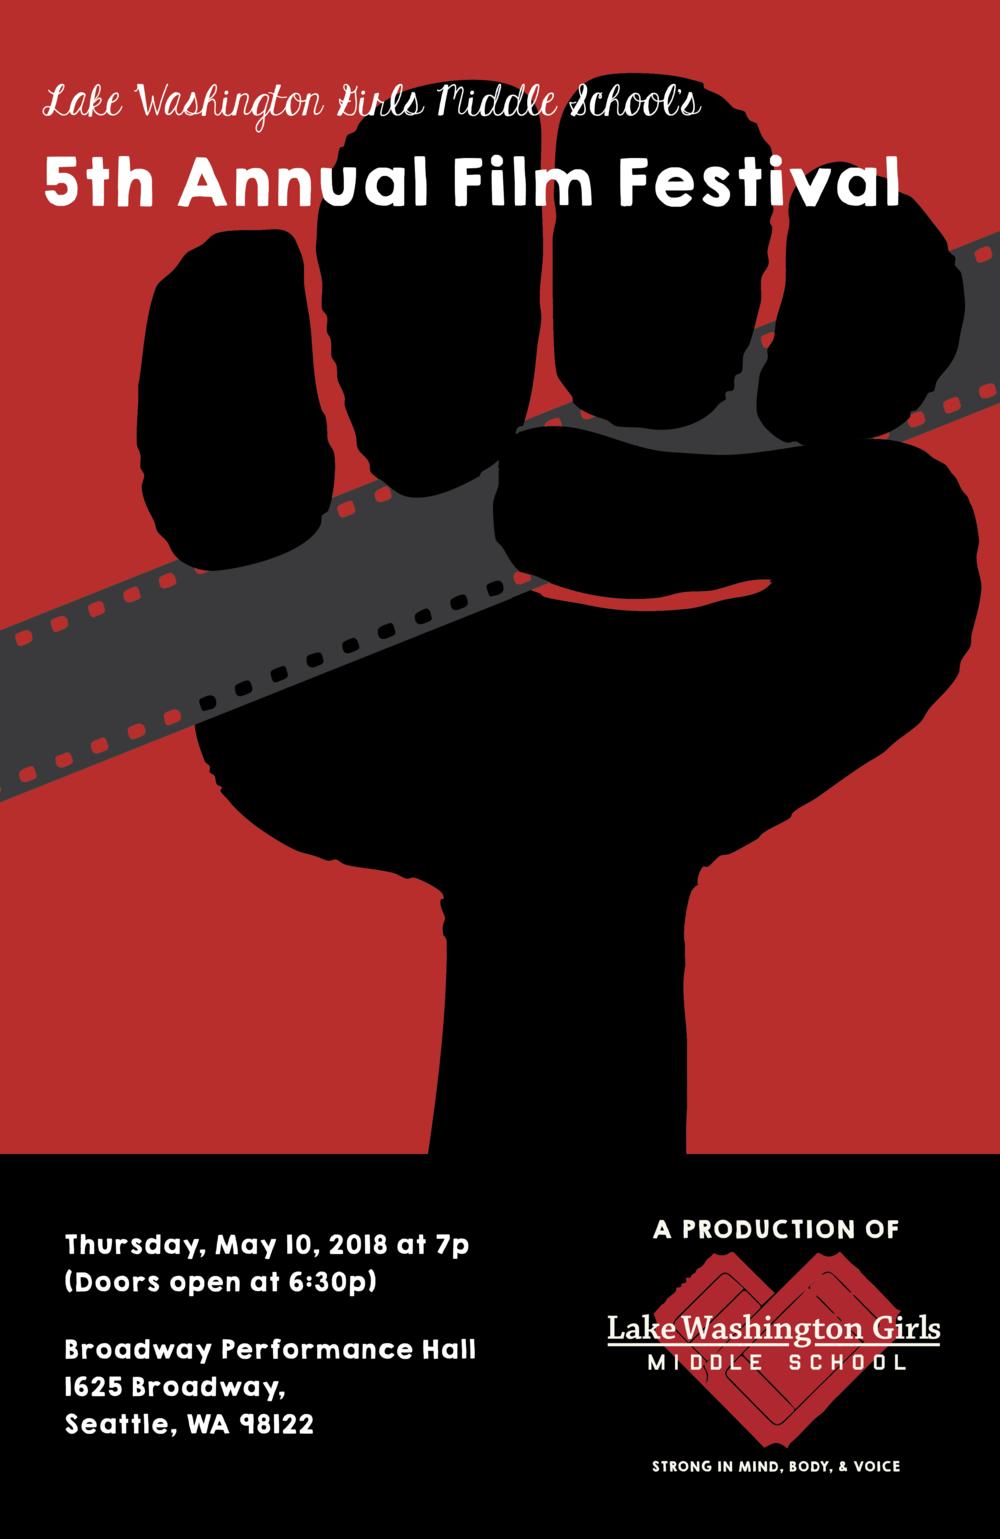 LWGMS Annual Social Justice Film Festival.